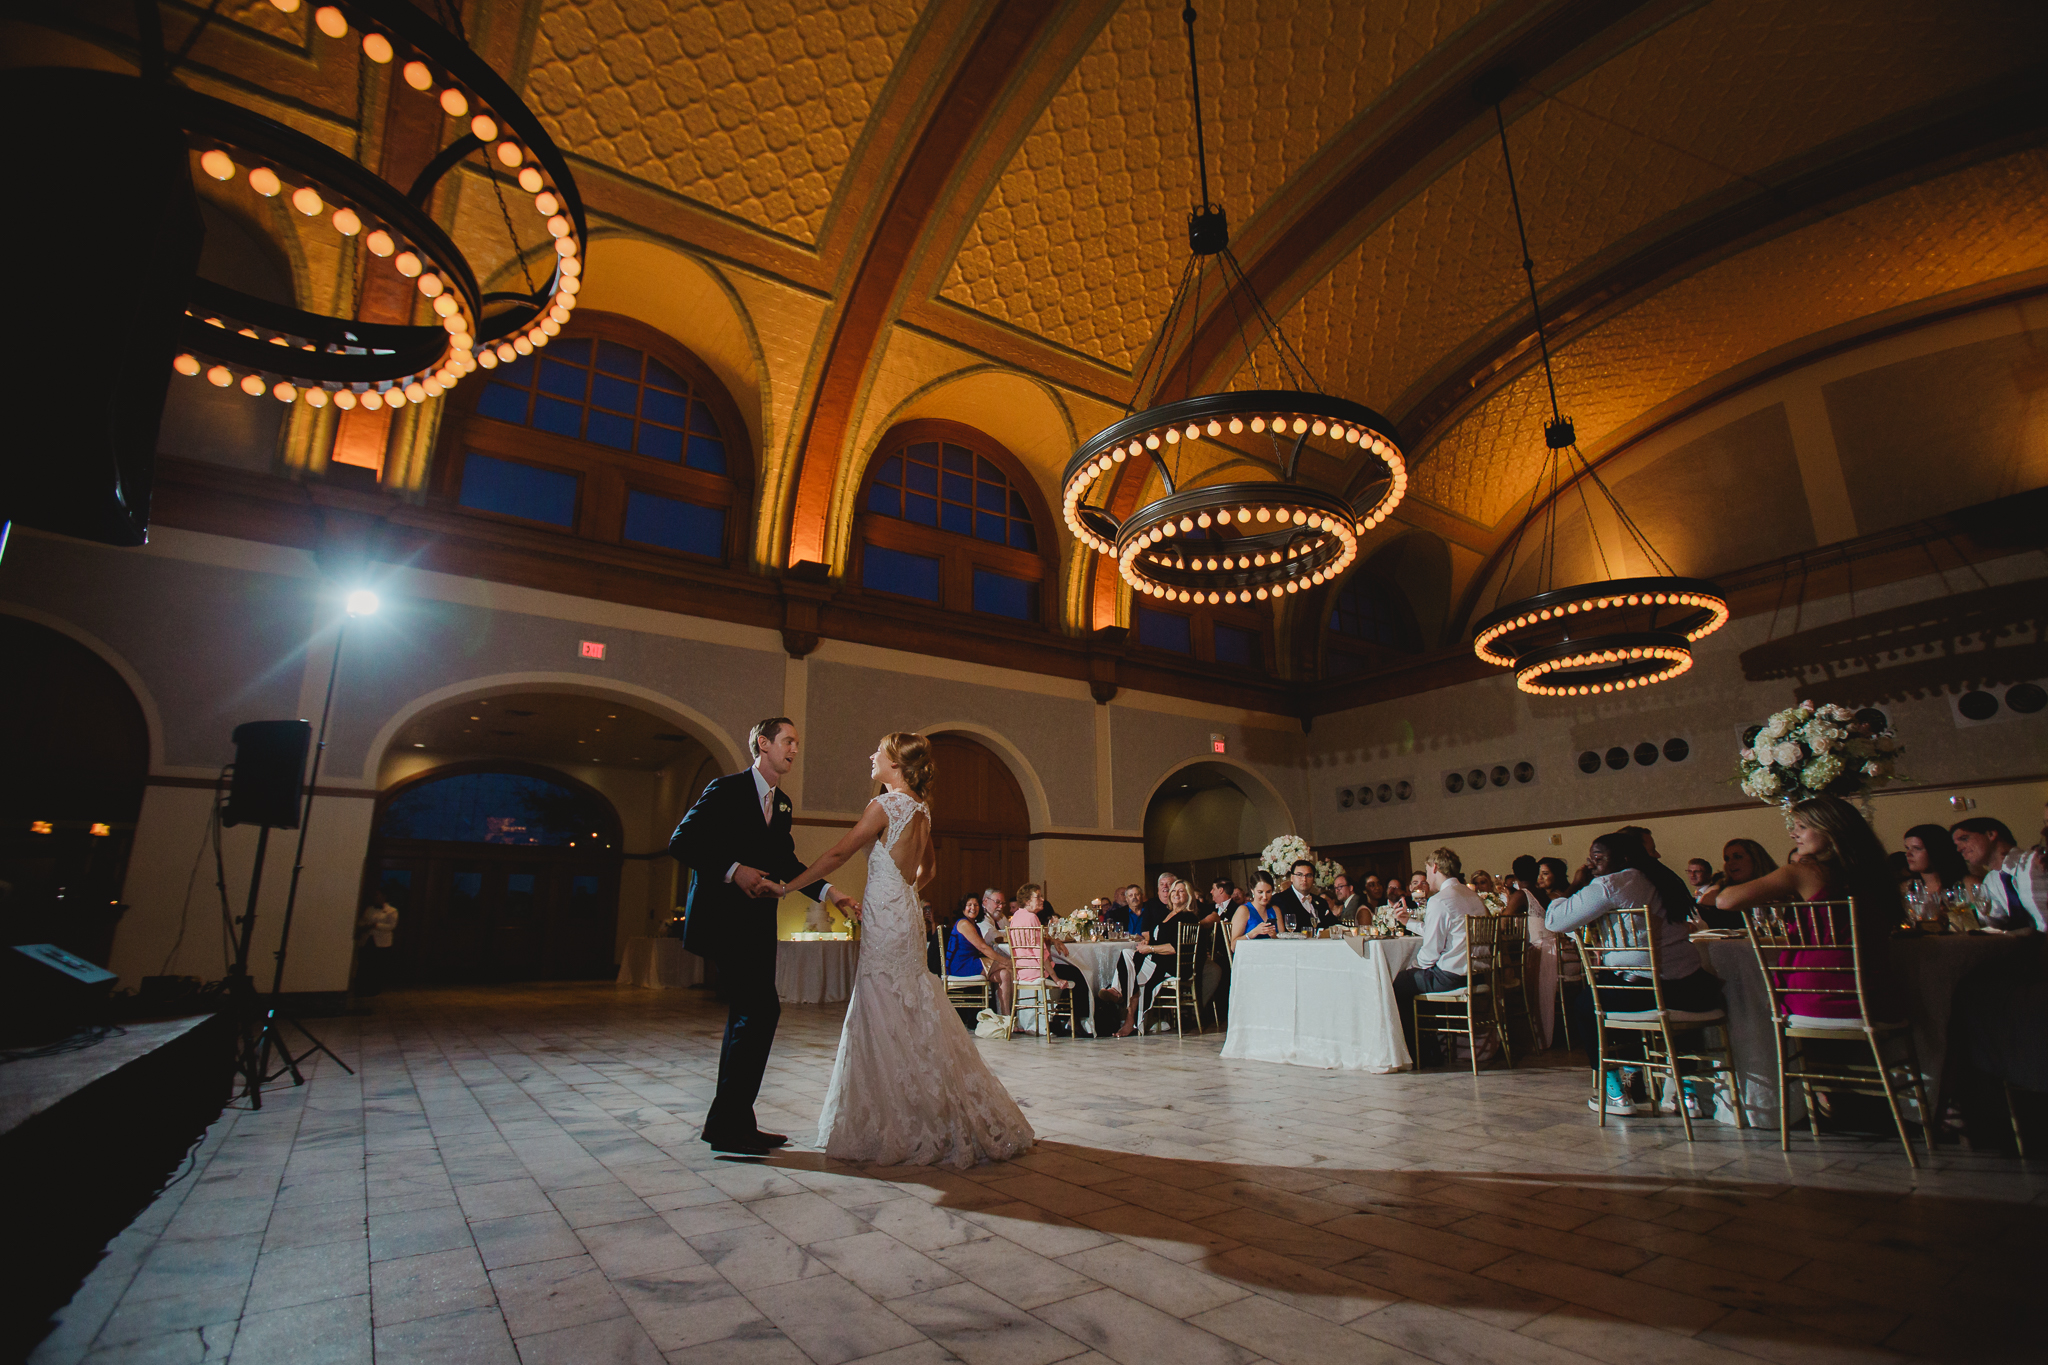 Michael and Kelly - the ashton depot - wedding DFW - wedding photographer- elizalde photography (114 of 150).jpg